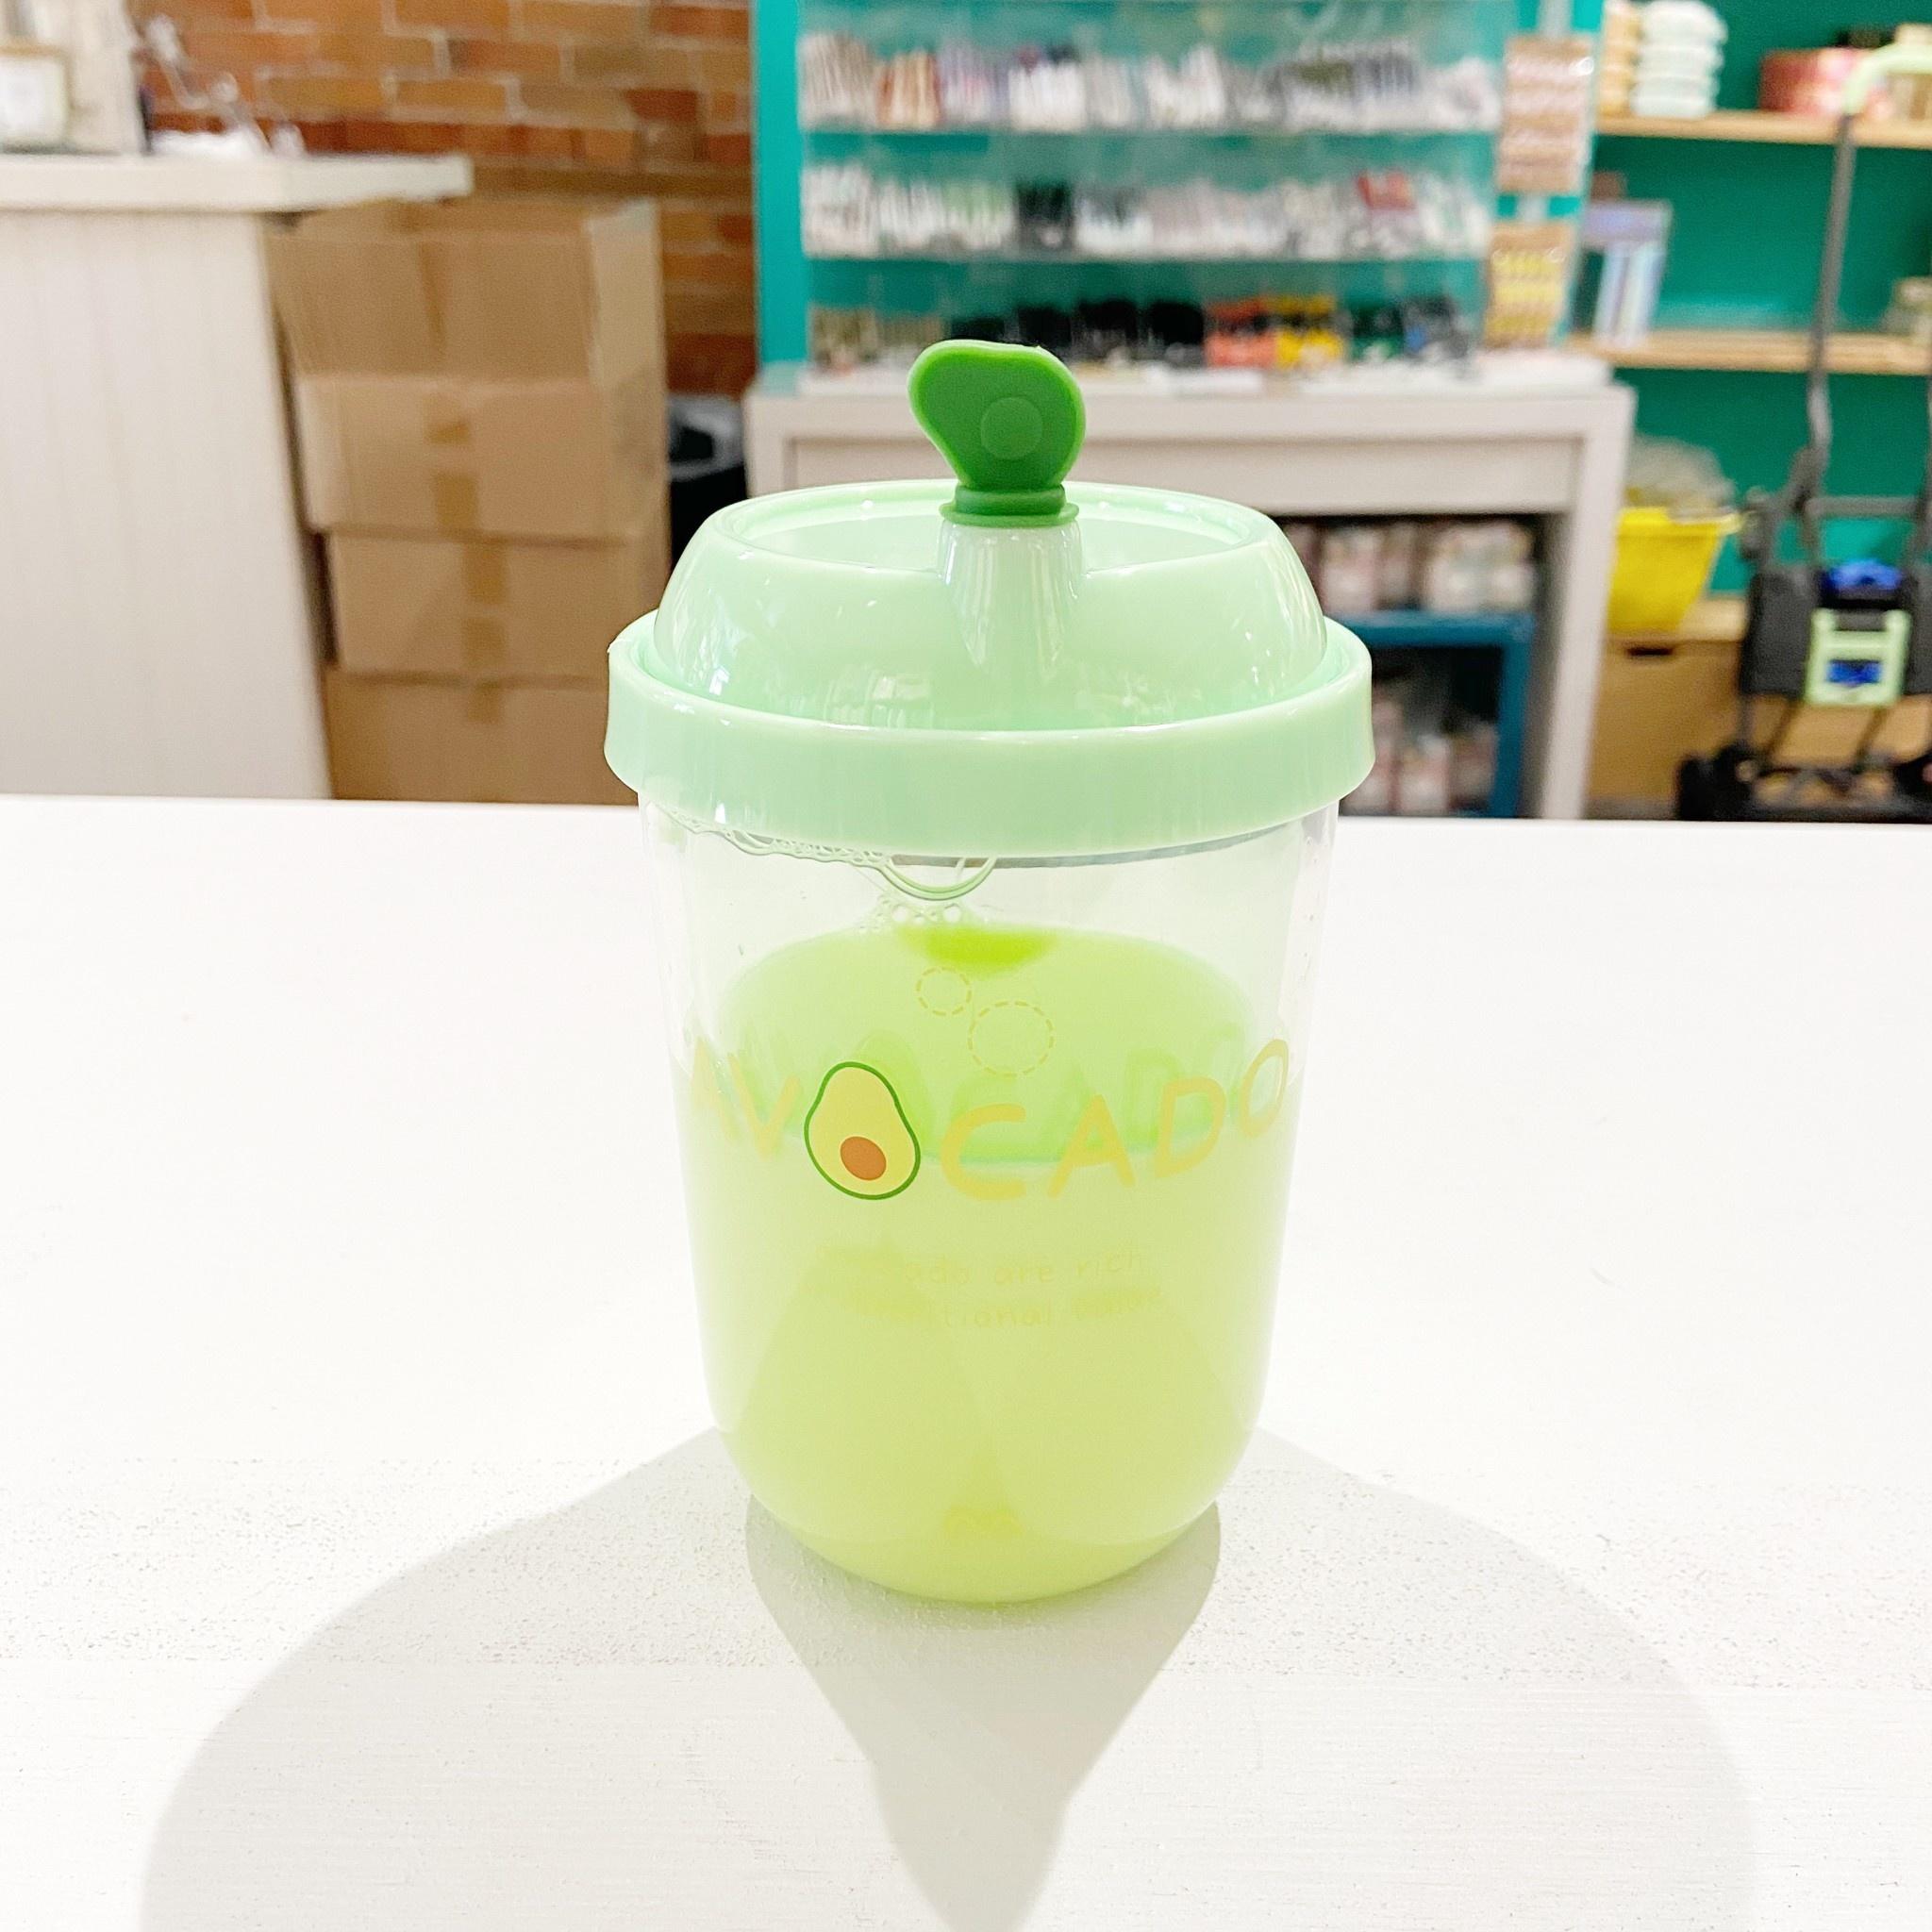 MHK030782 Avocado Lemon Plastic Waterbottle